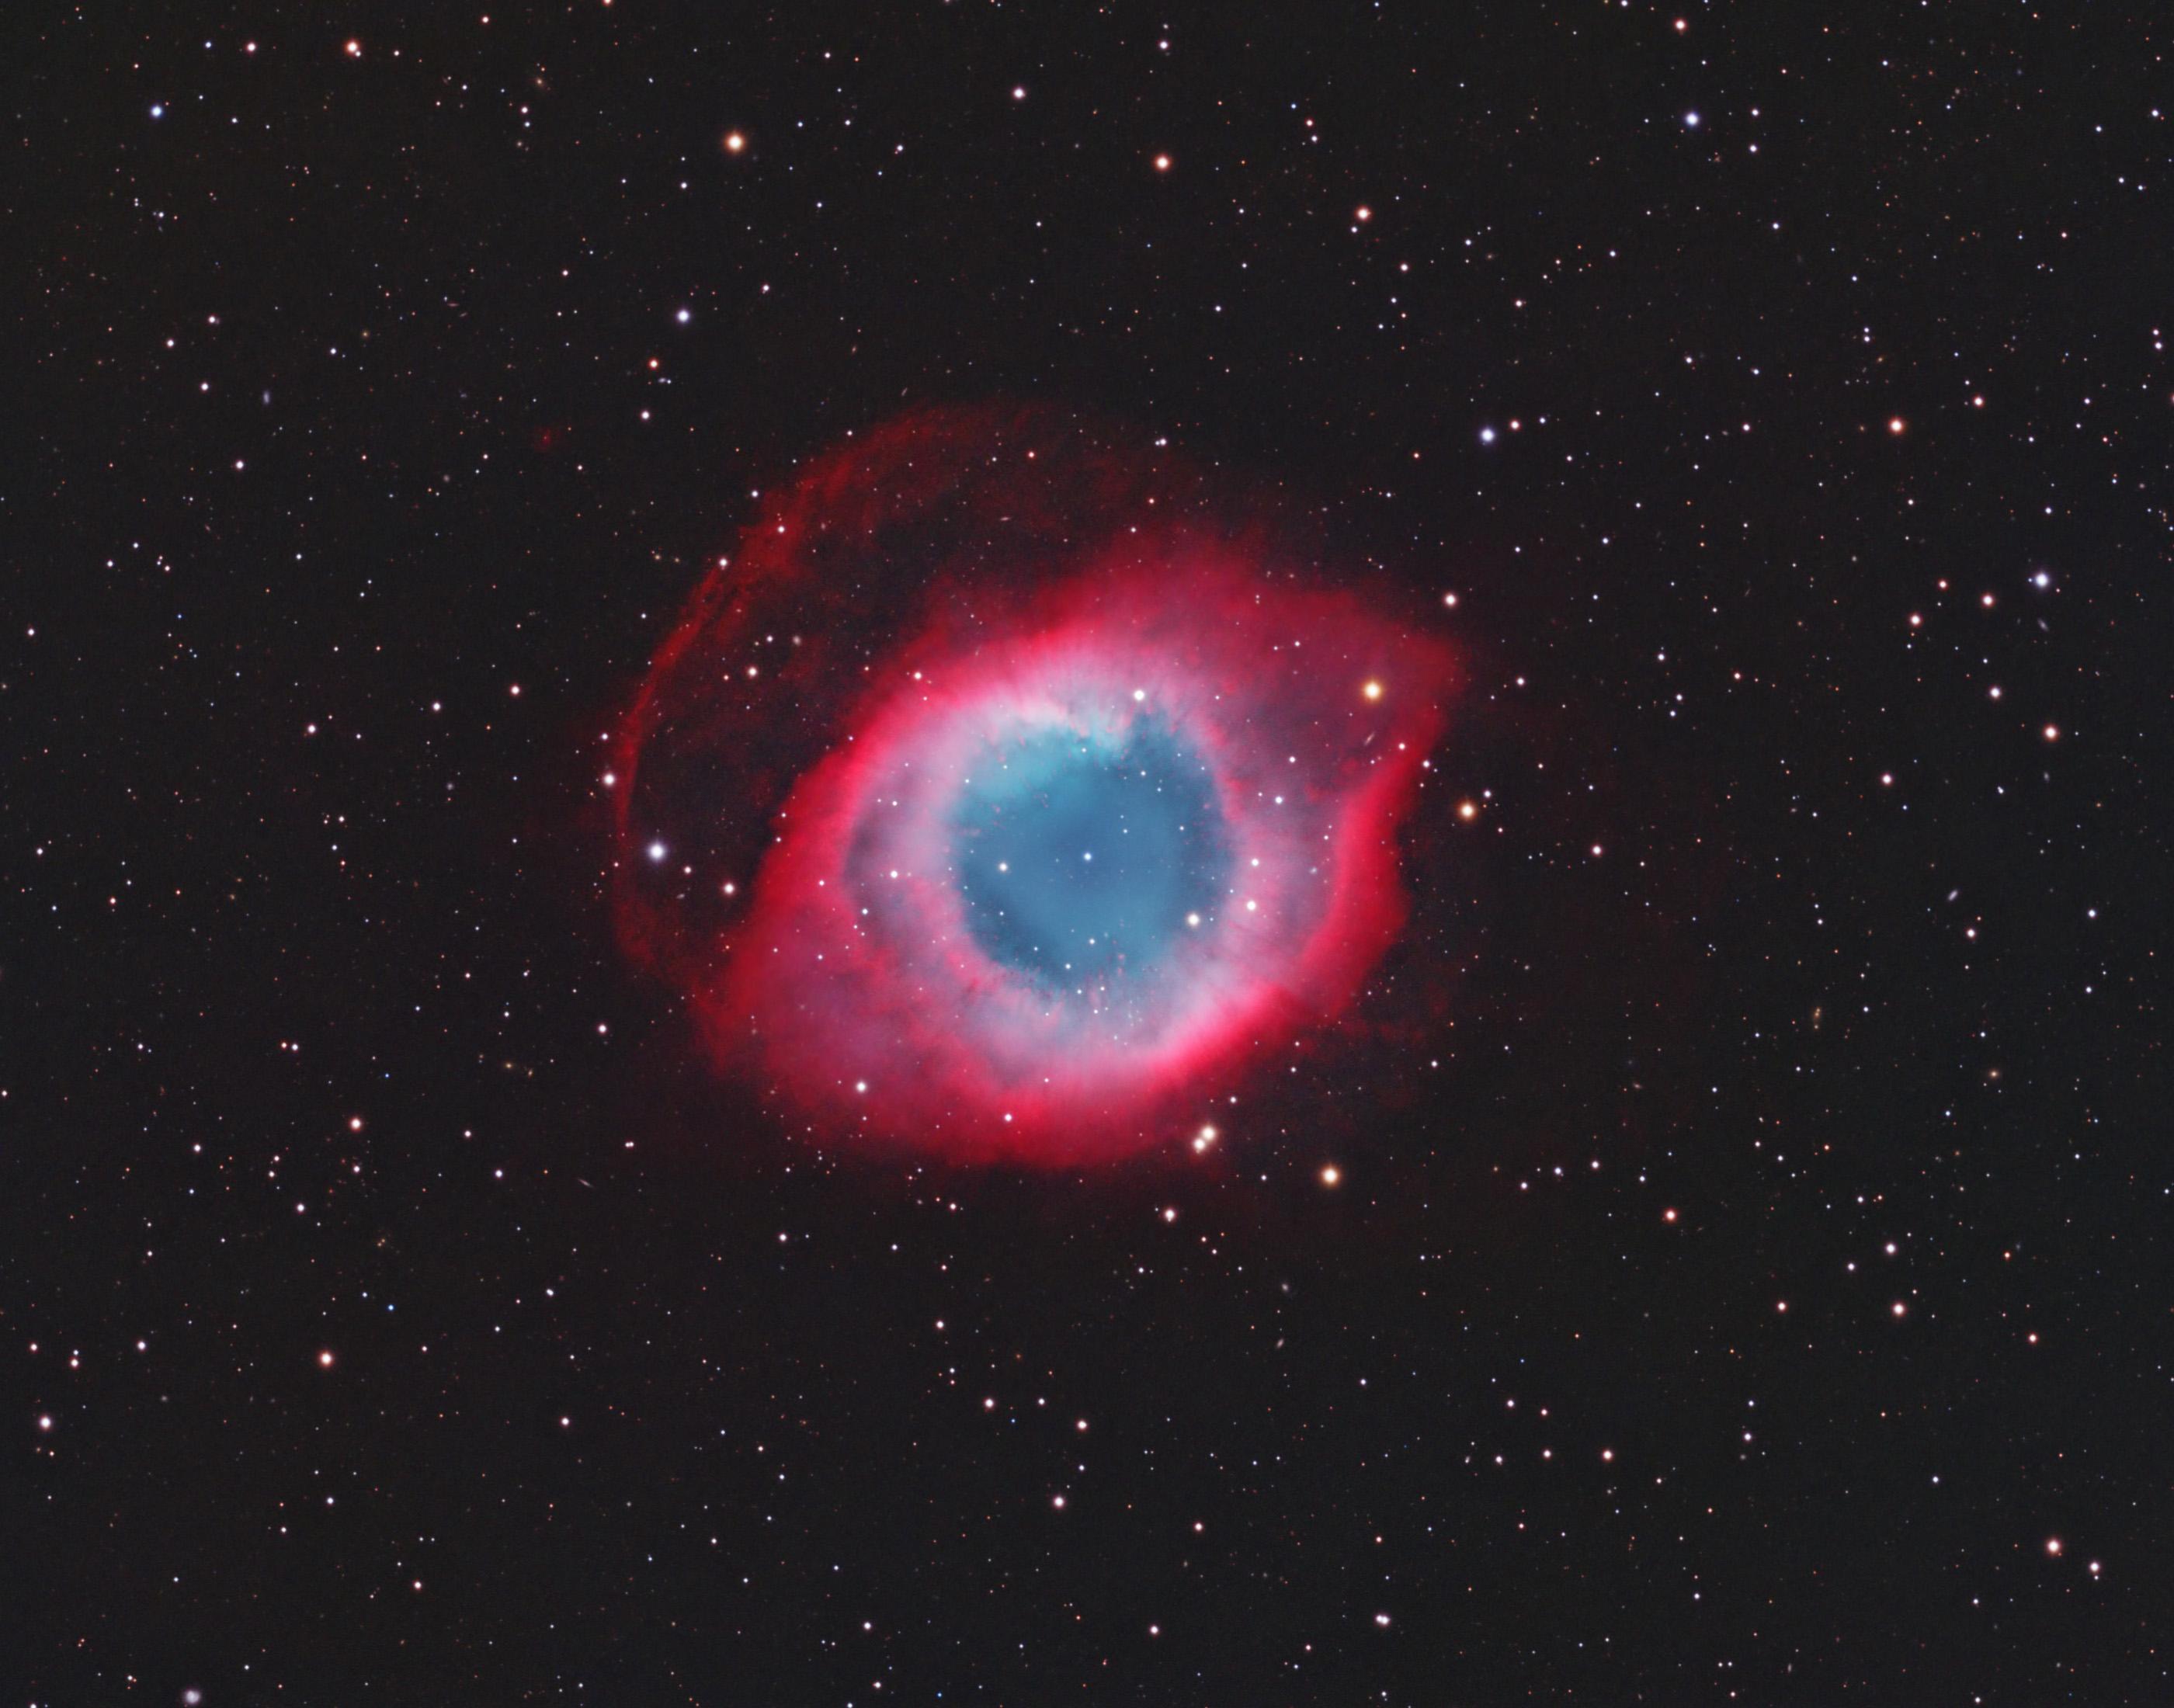 helix nebula constellation aquarius - photo #25